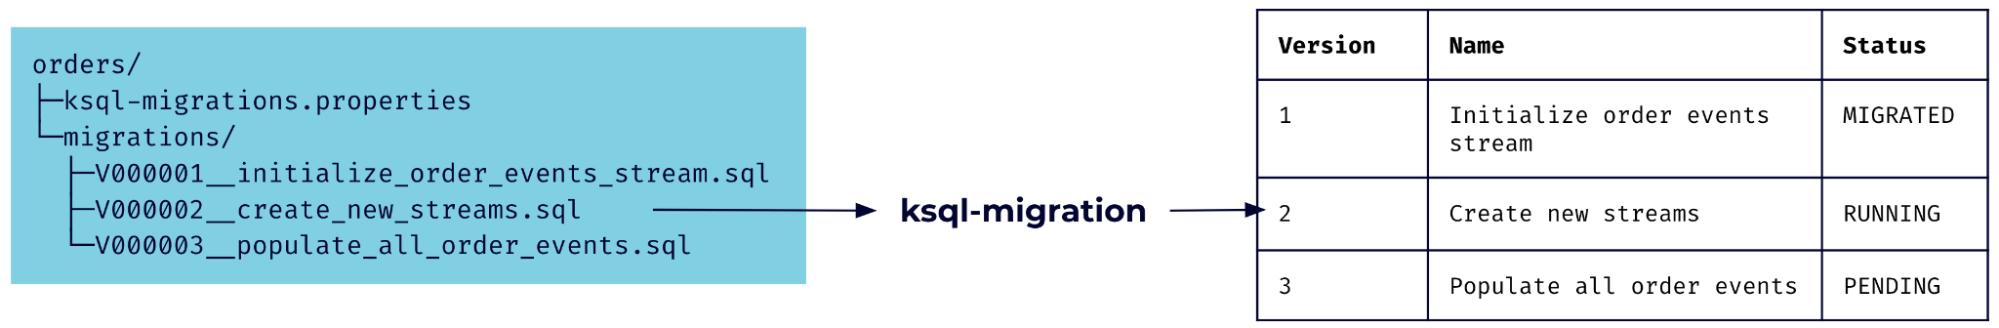 ksql-migrations tool